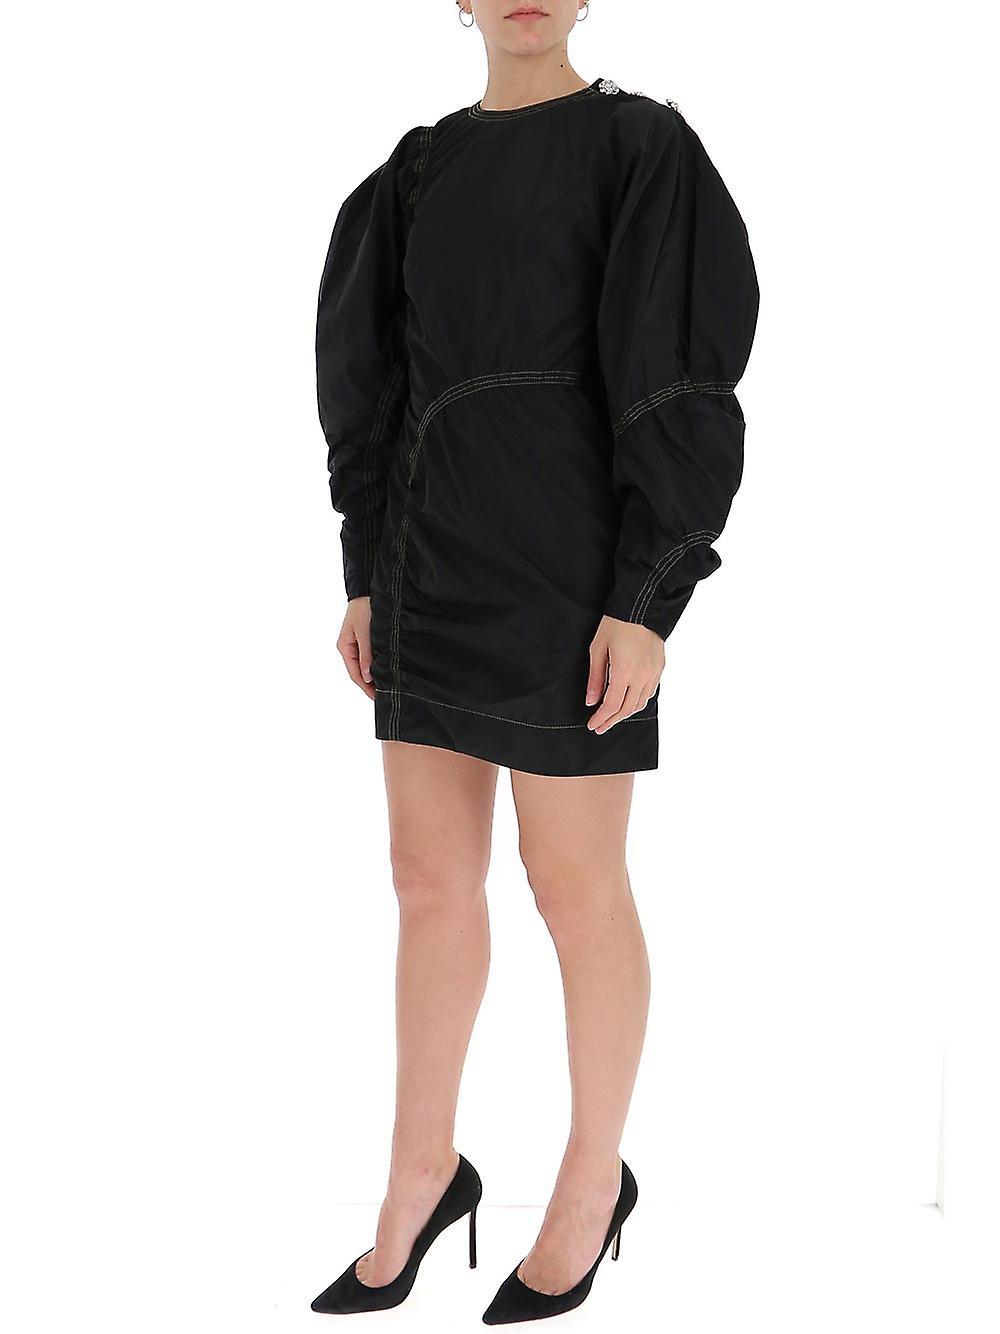 Ganni F4343099 Women-apos;s Robe en coton noir mvcVRk